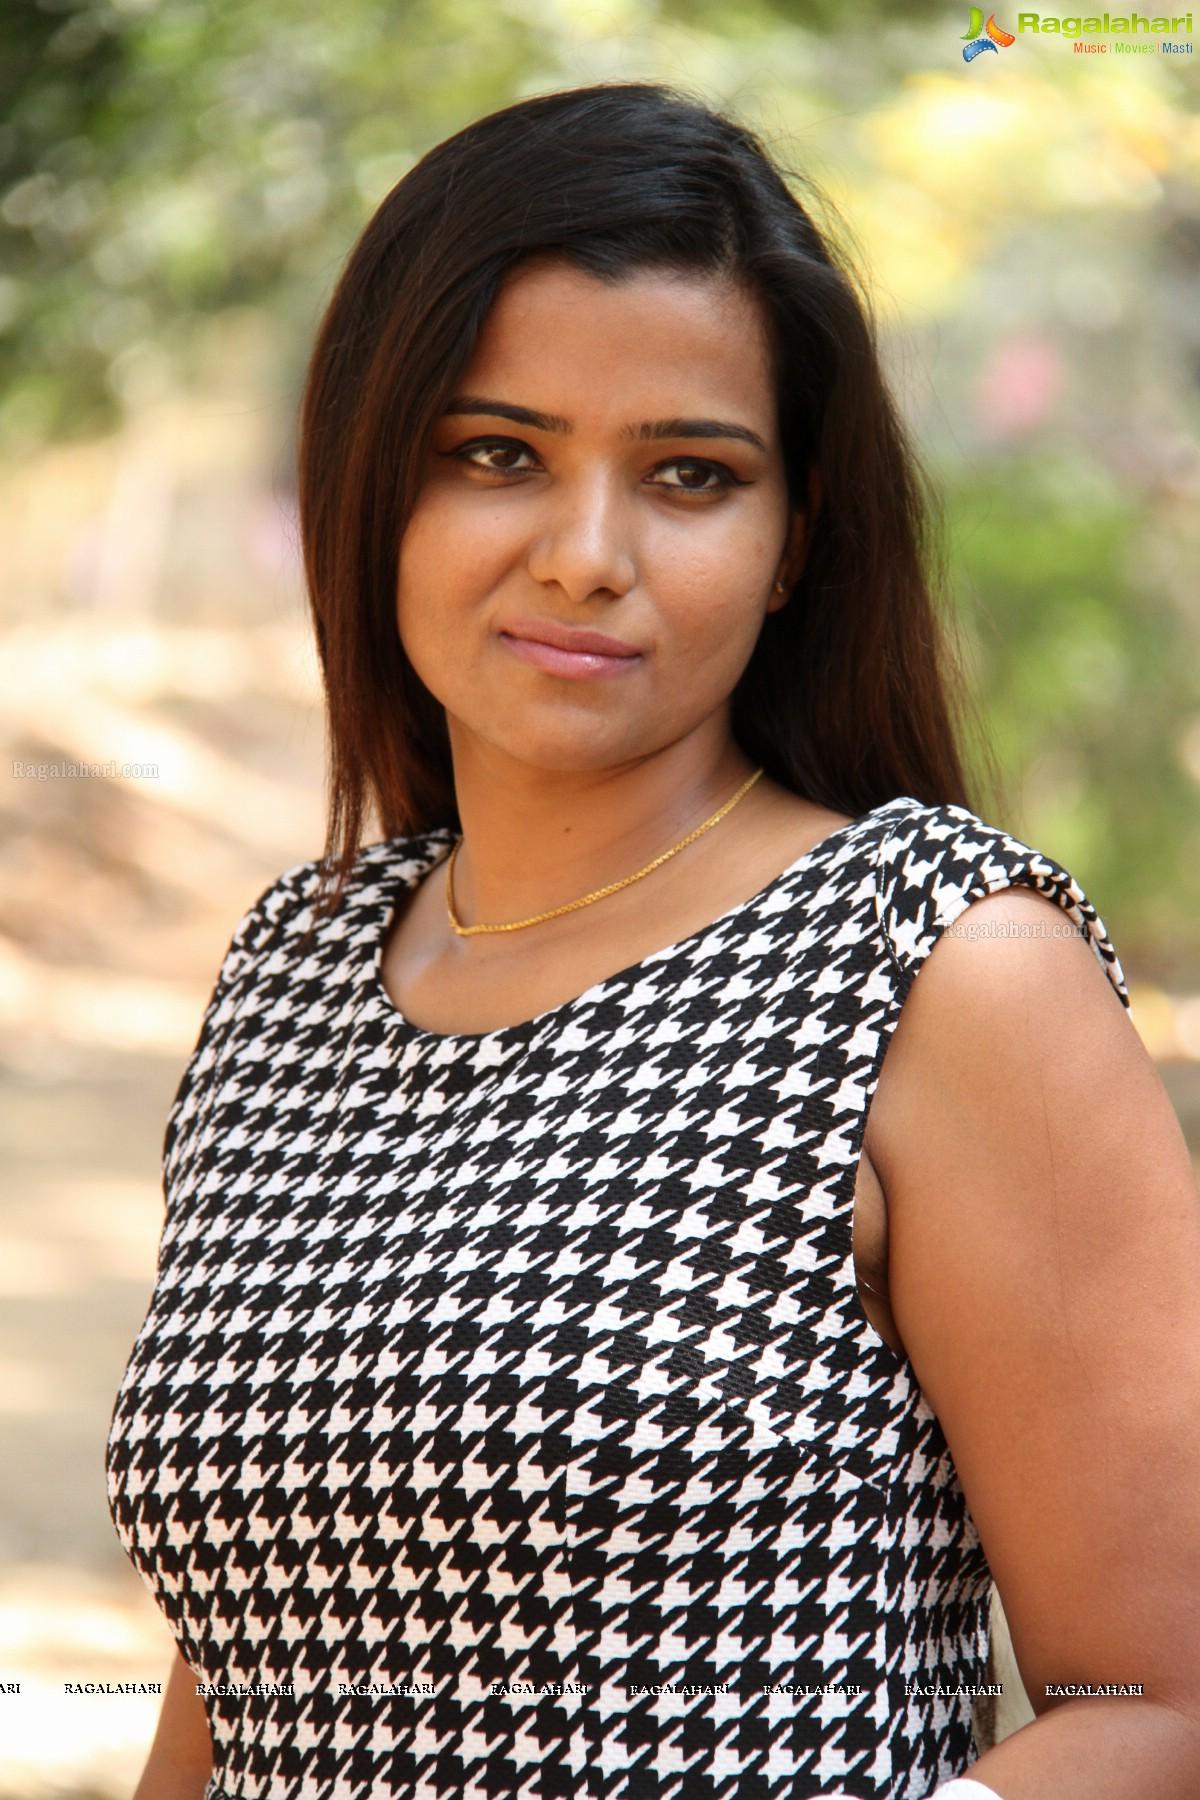 Watch Sandhya video